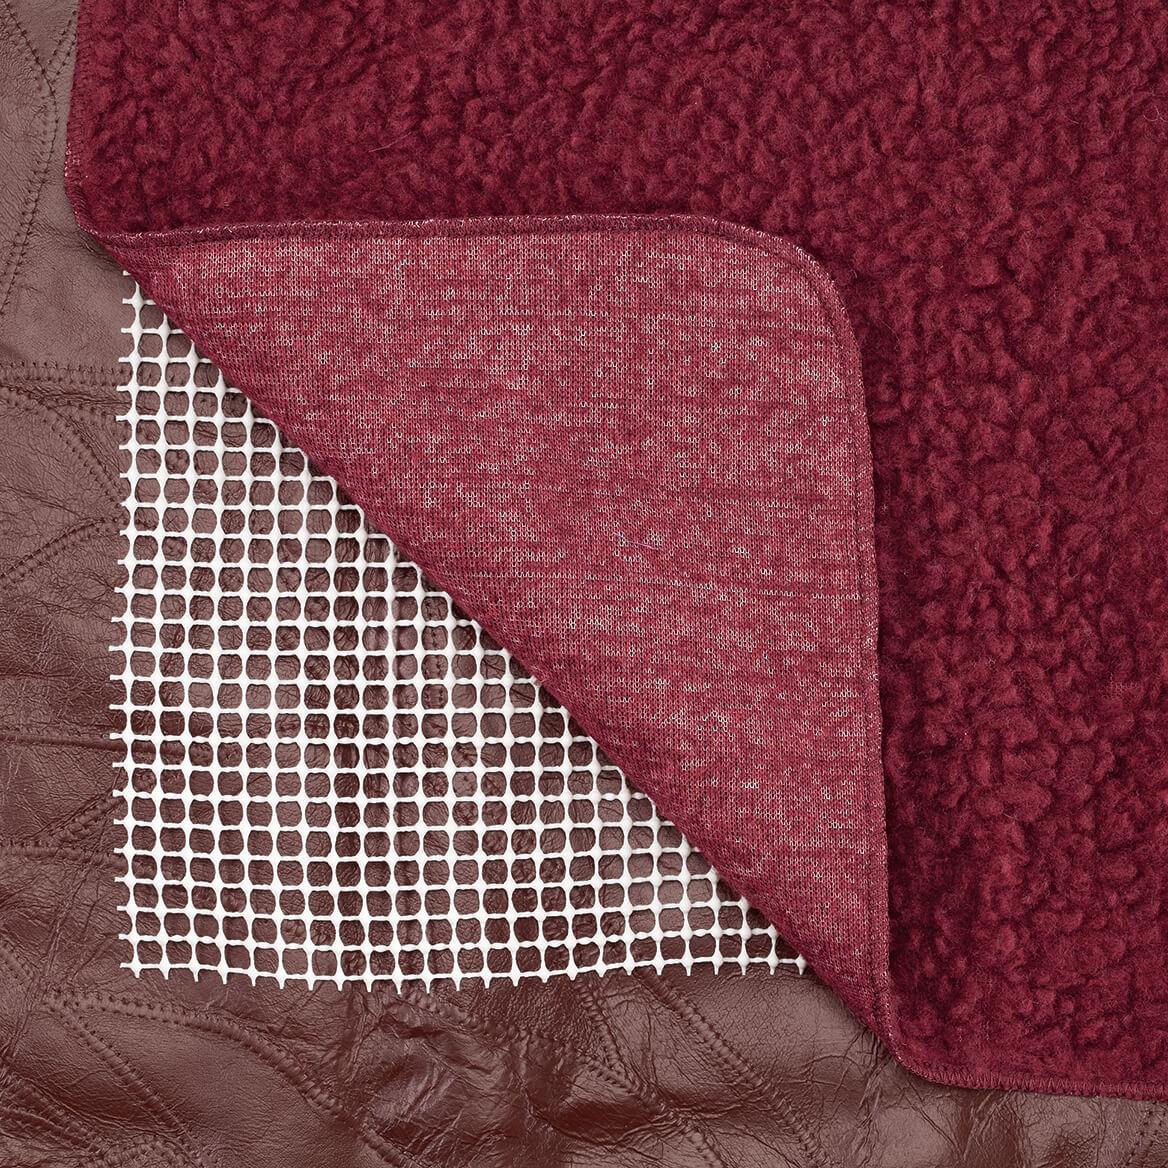 Slipcover Grip Pad-348229